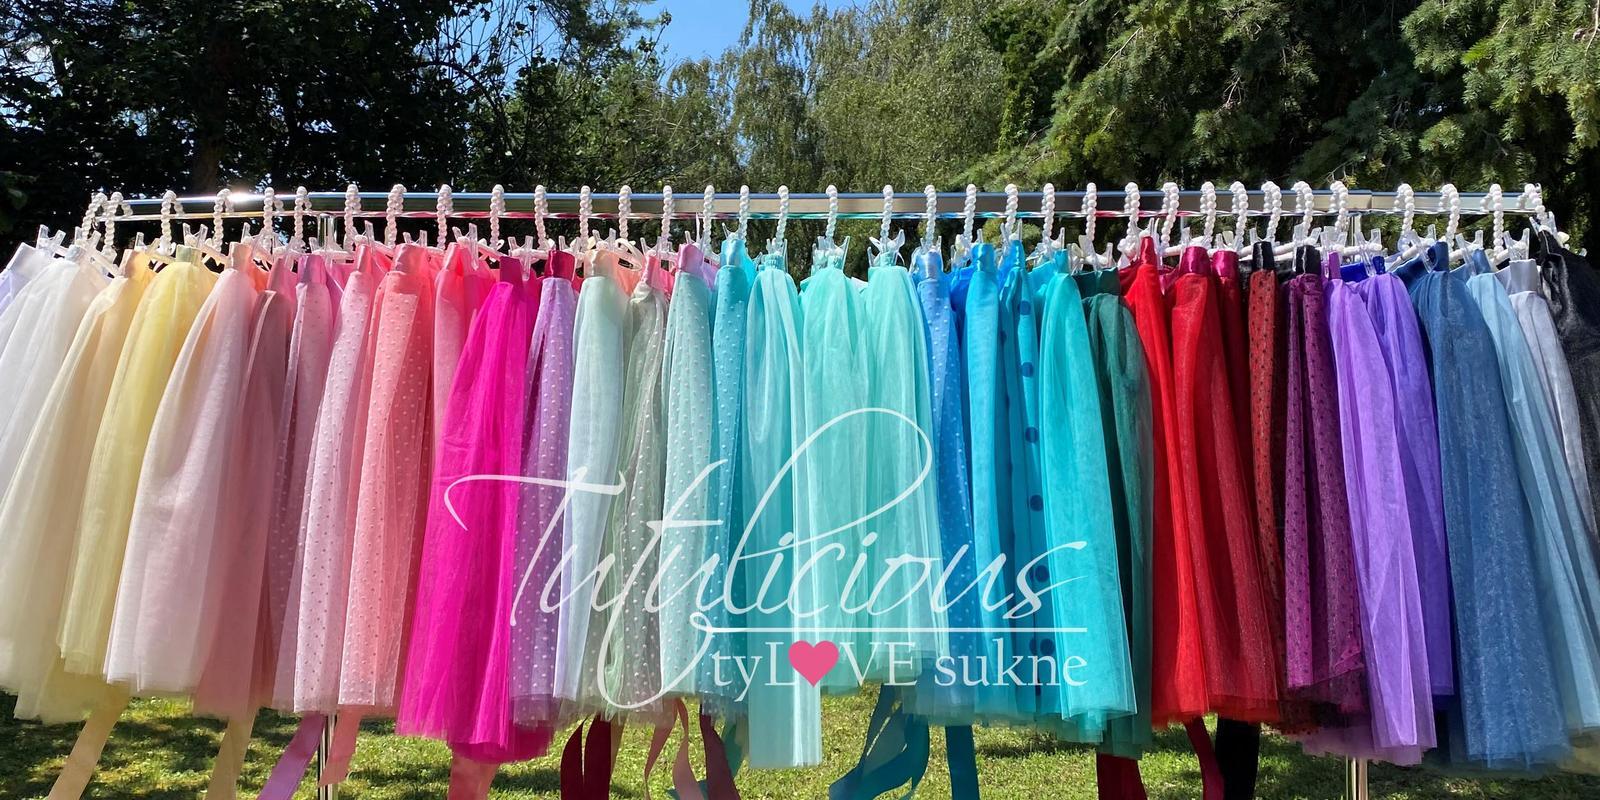 20% zľava na TUTUlicious tylove sukne - s kódom TUTU20 na: www.salondiamond.sk/eshop/tutulicious-tylove-sukne